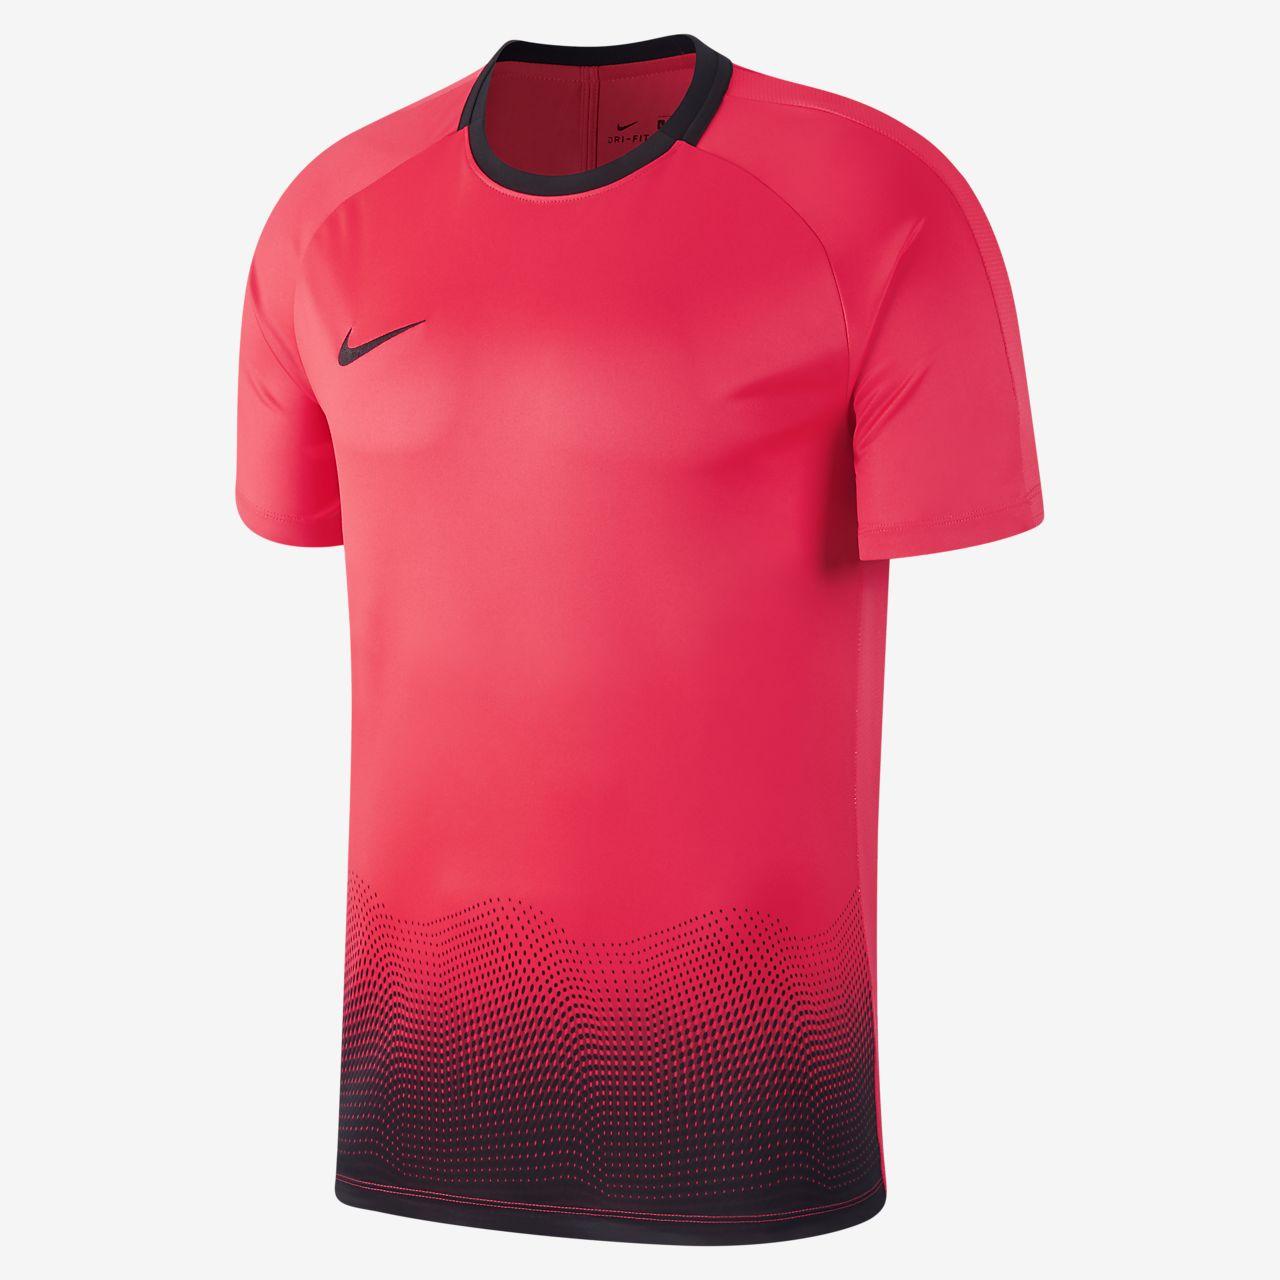 ... Nike Dri-FIT Academy Men's Short-Sleeve Football Top